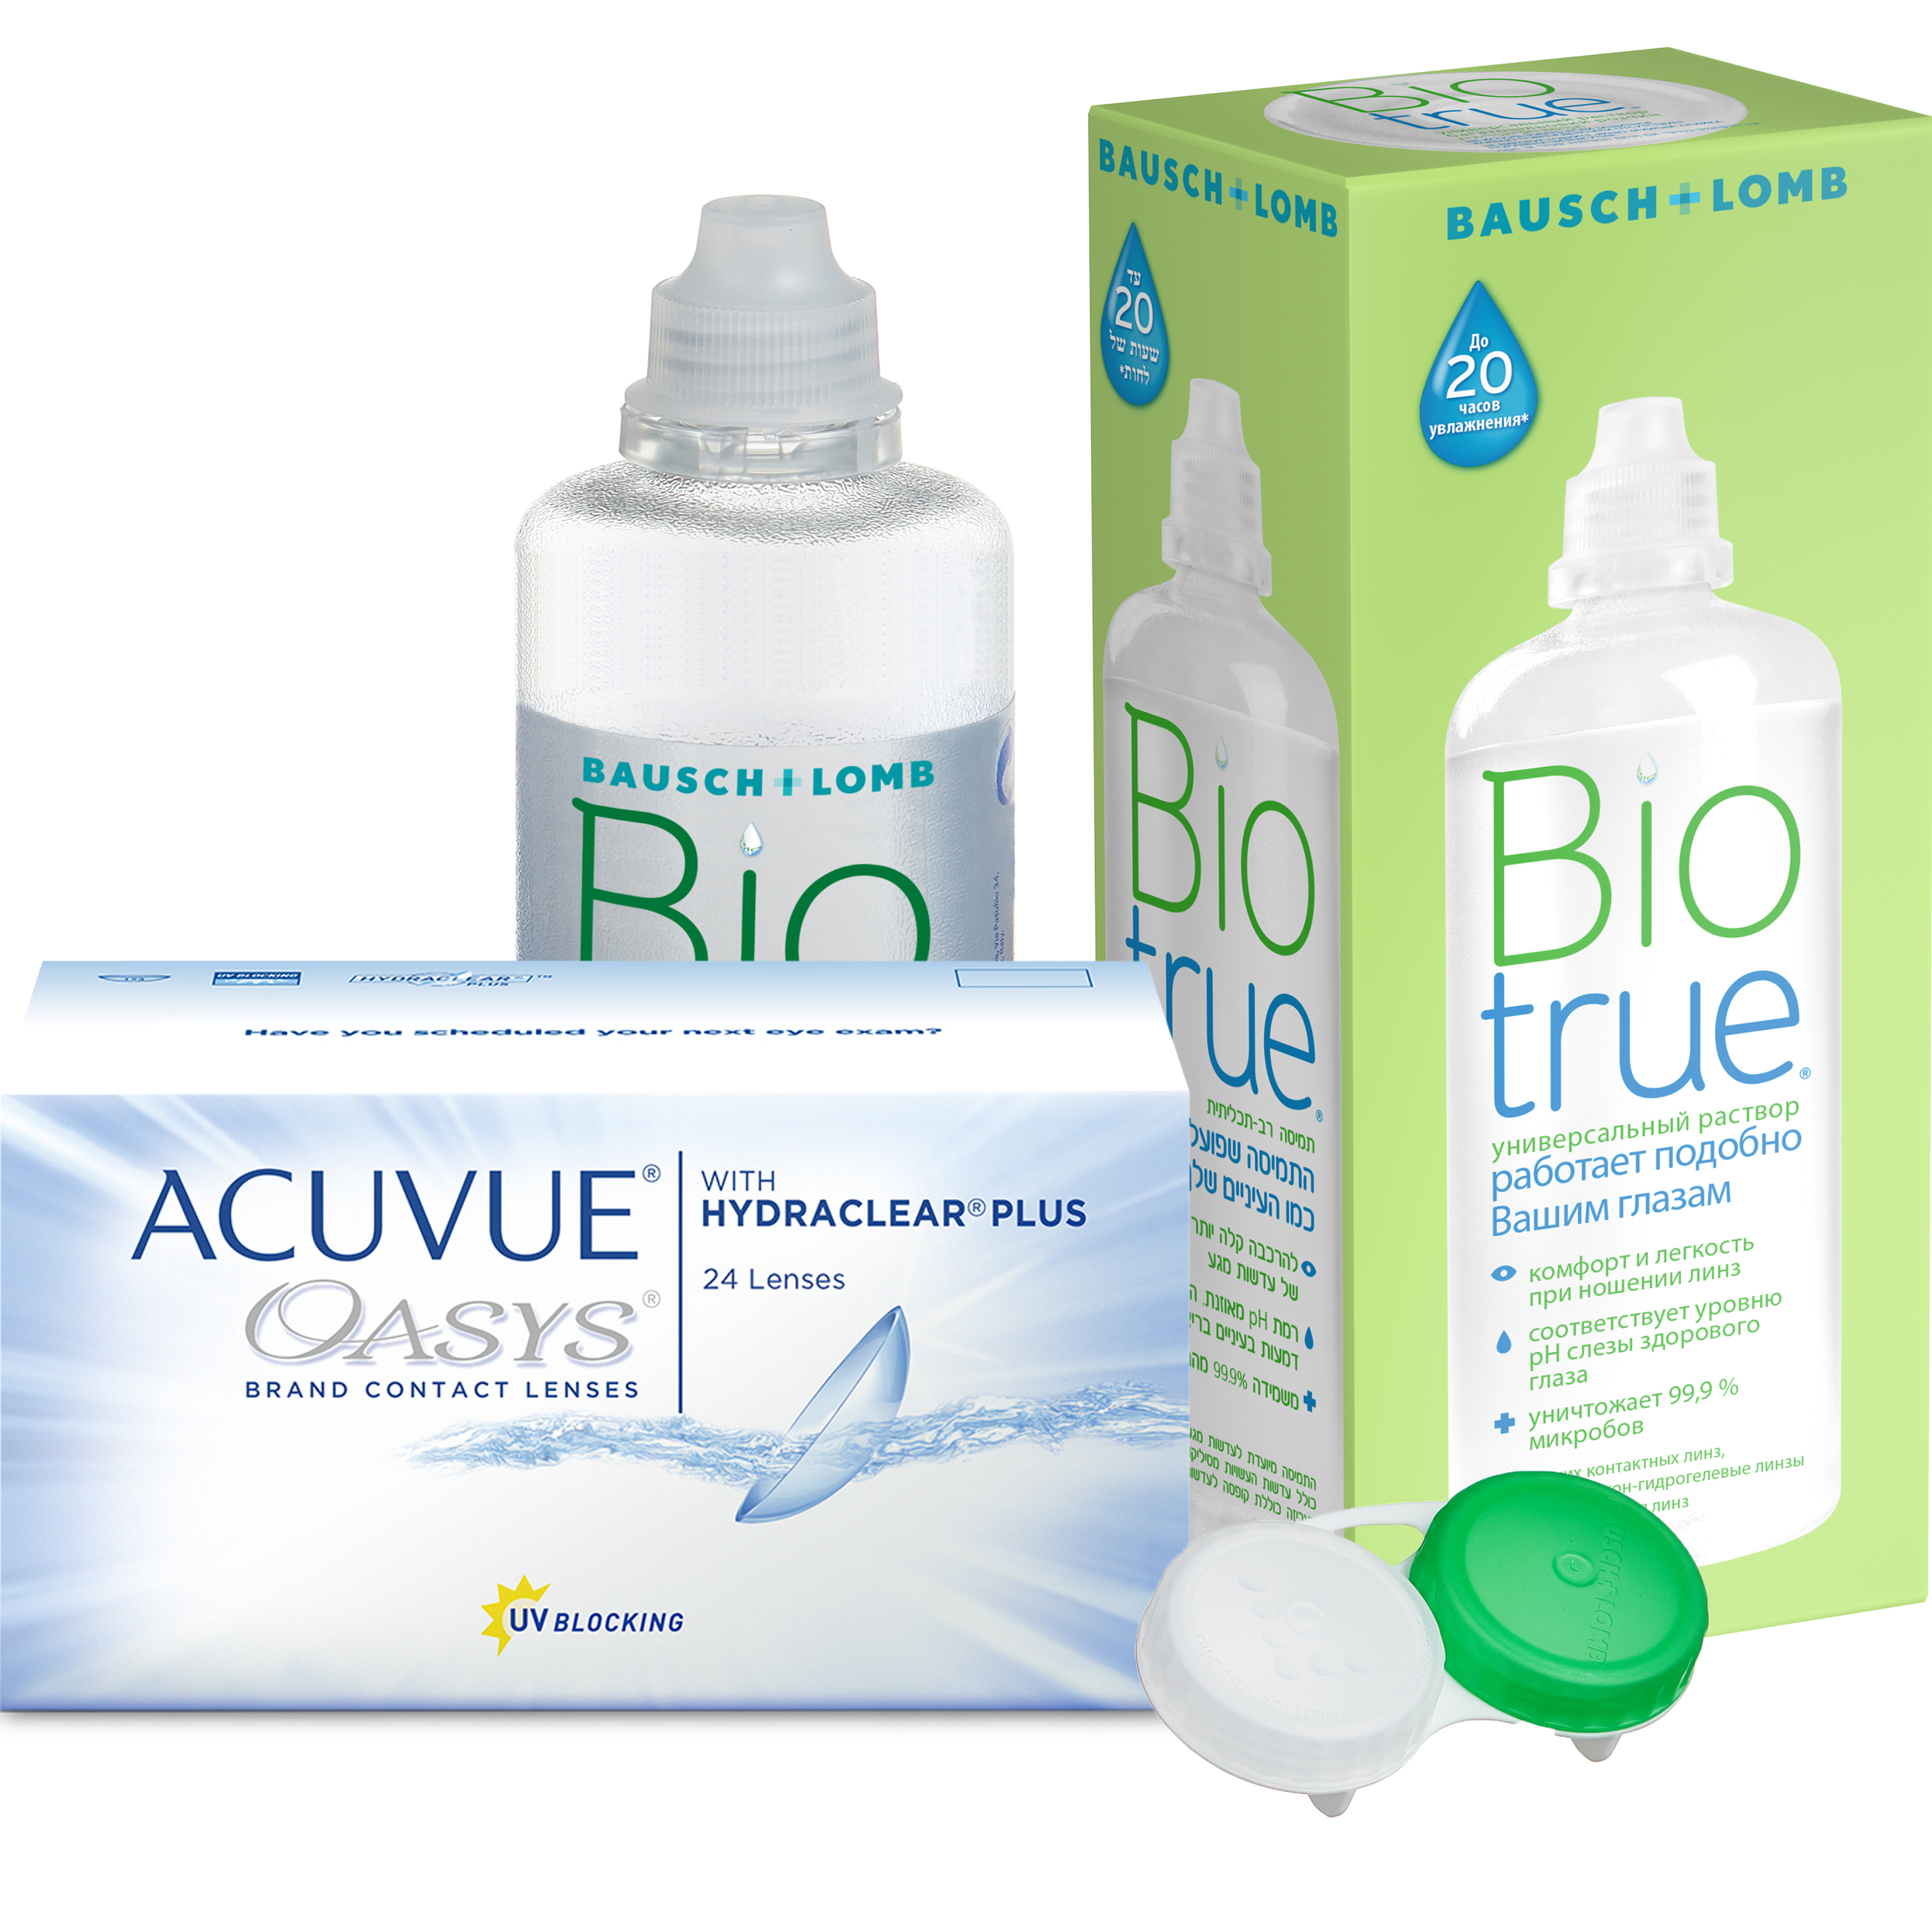 Купить Oasys with Hydraclear Plus 24 линзы + Biotrue, Контактные линзы Acuvue Oasys with Hydraclear Plus 24 линзы R 8.8 +1, 75 + Biotrue 300 мл